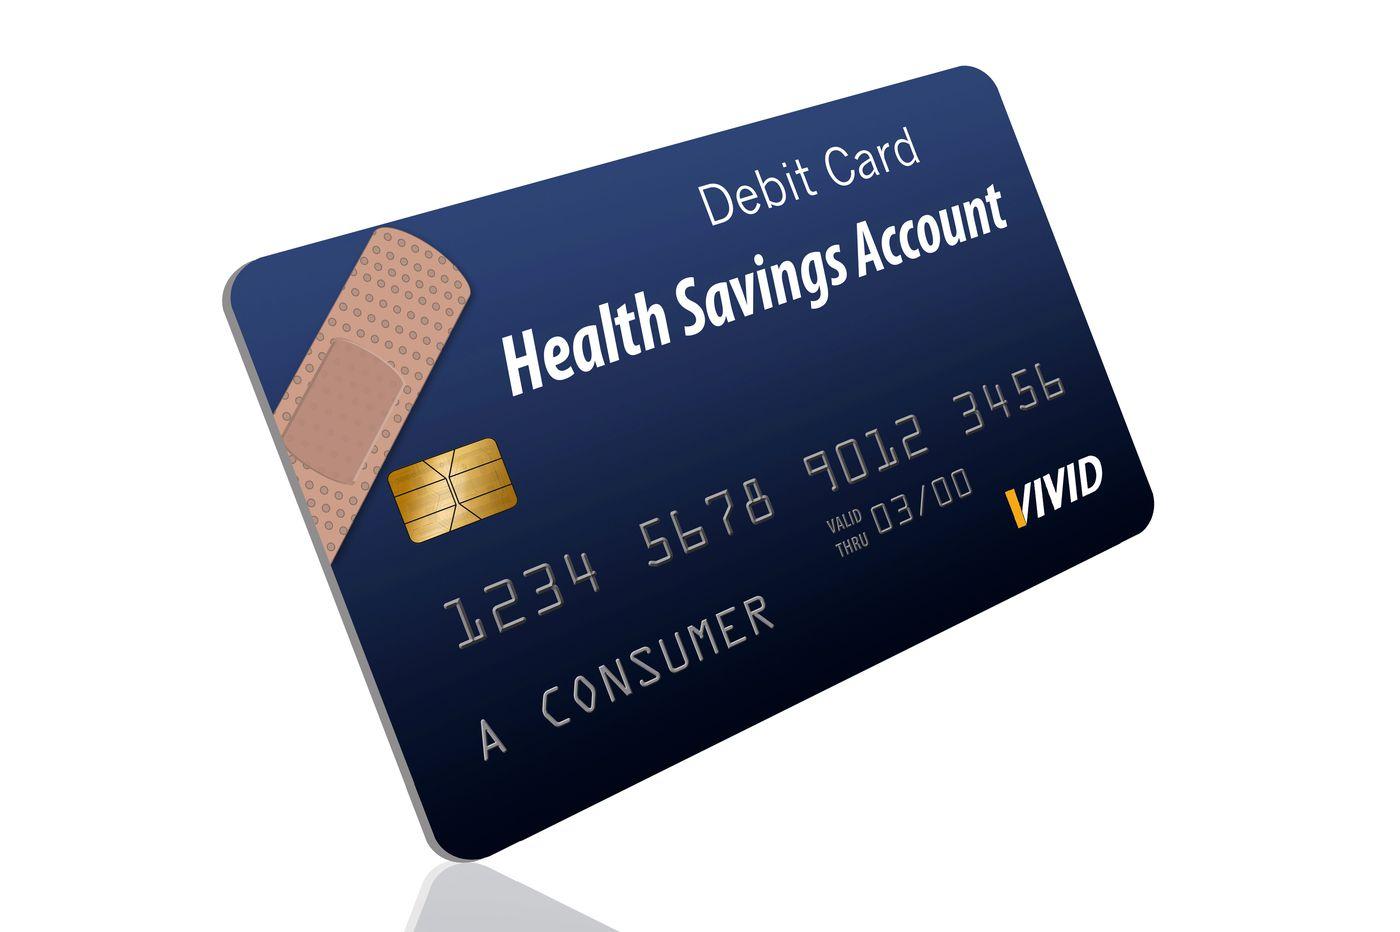 Health savings accounts: a 'stealth' retirement vehicle